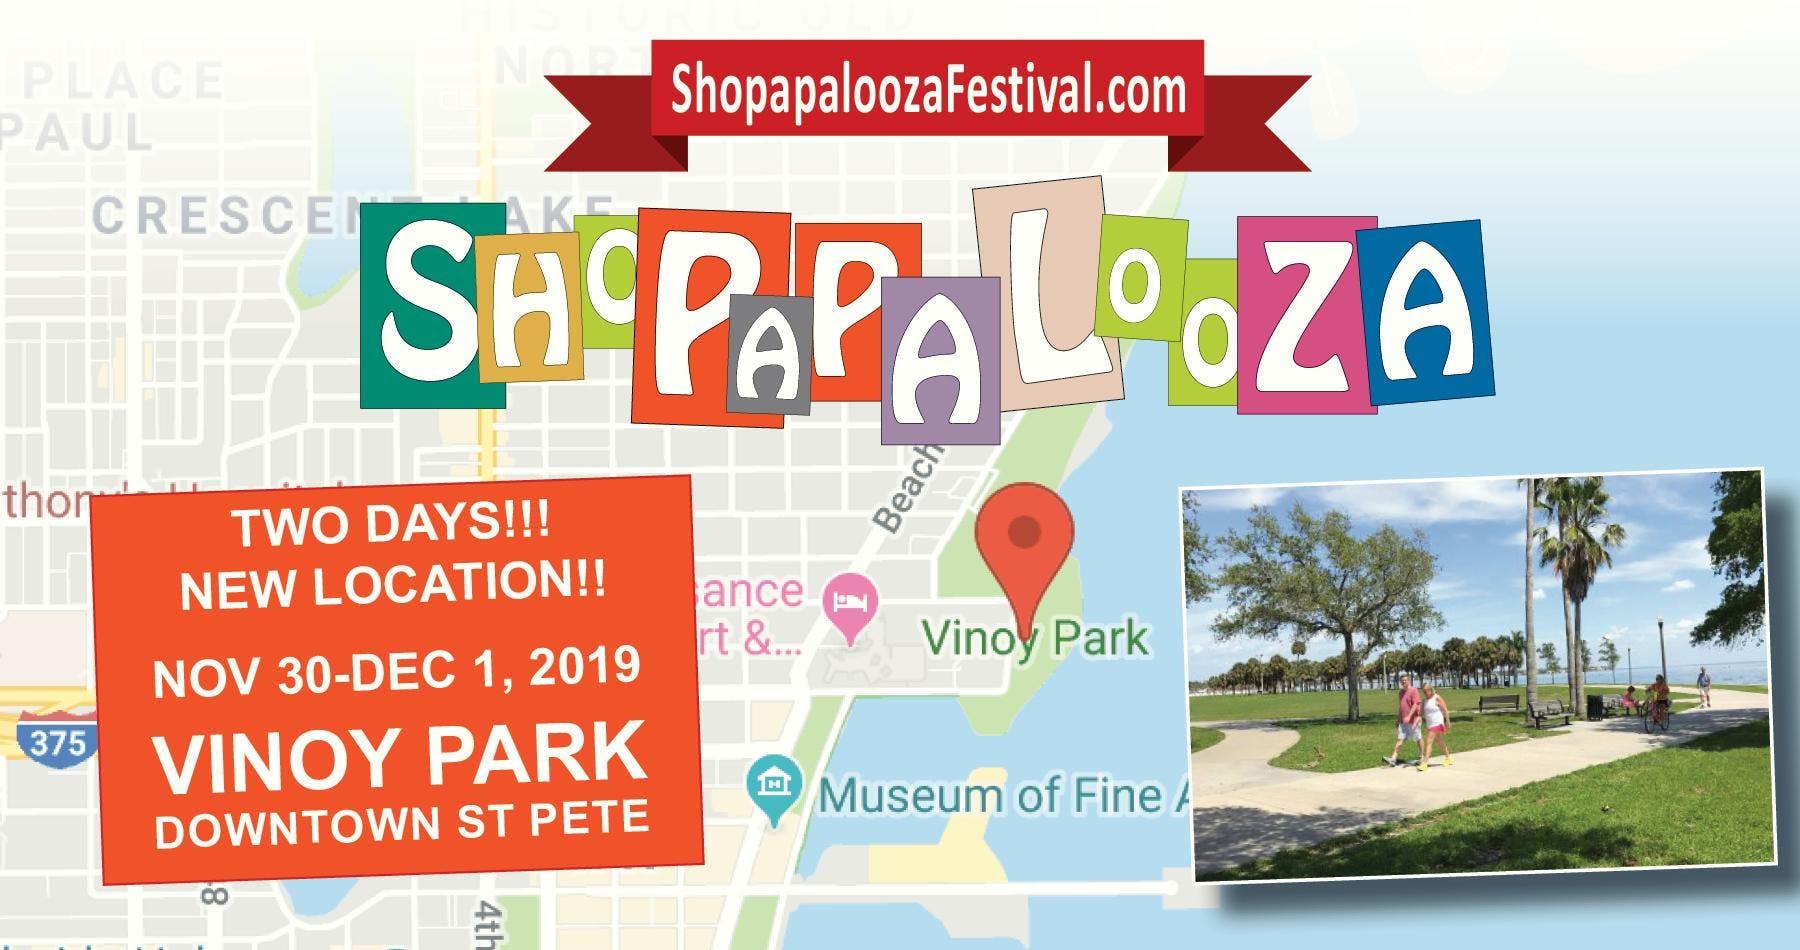 2019 Annual Shopapalooza Festival